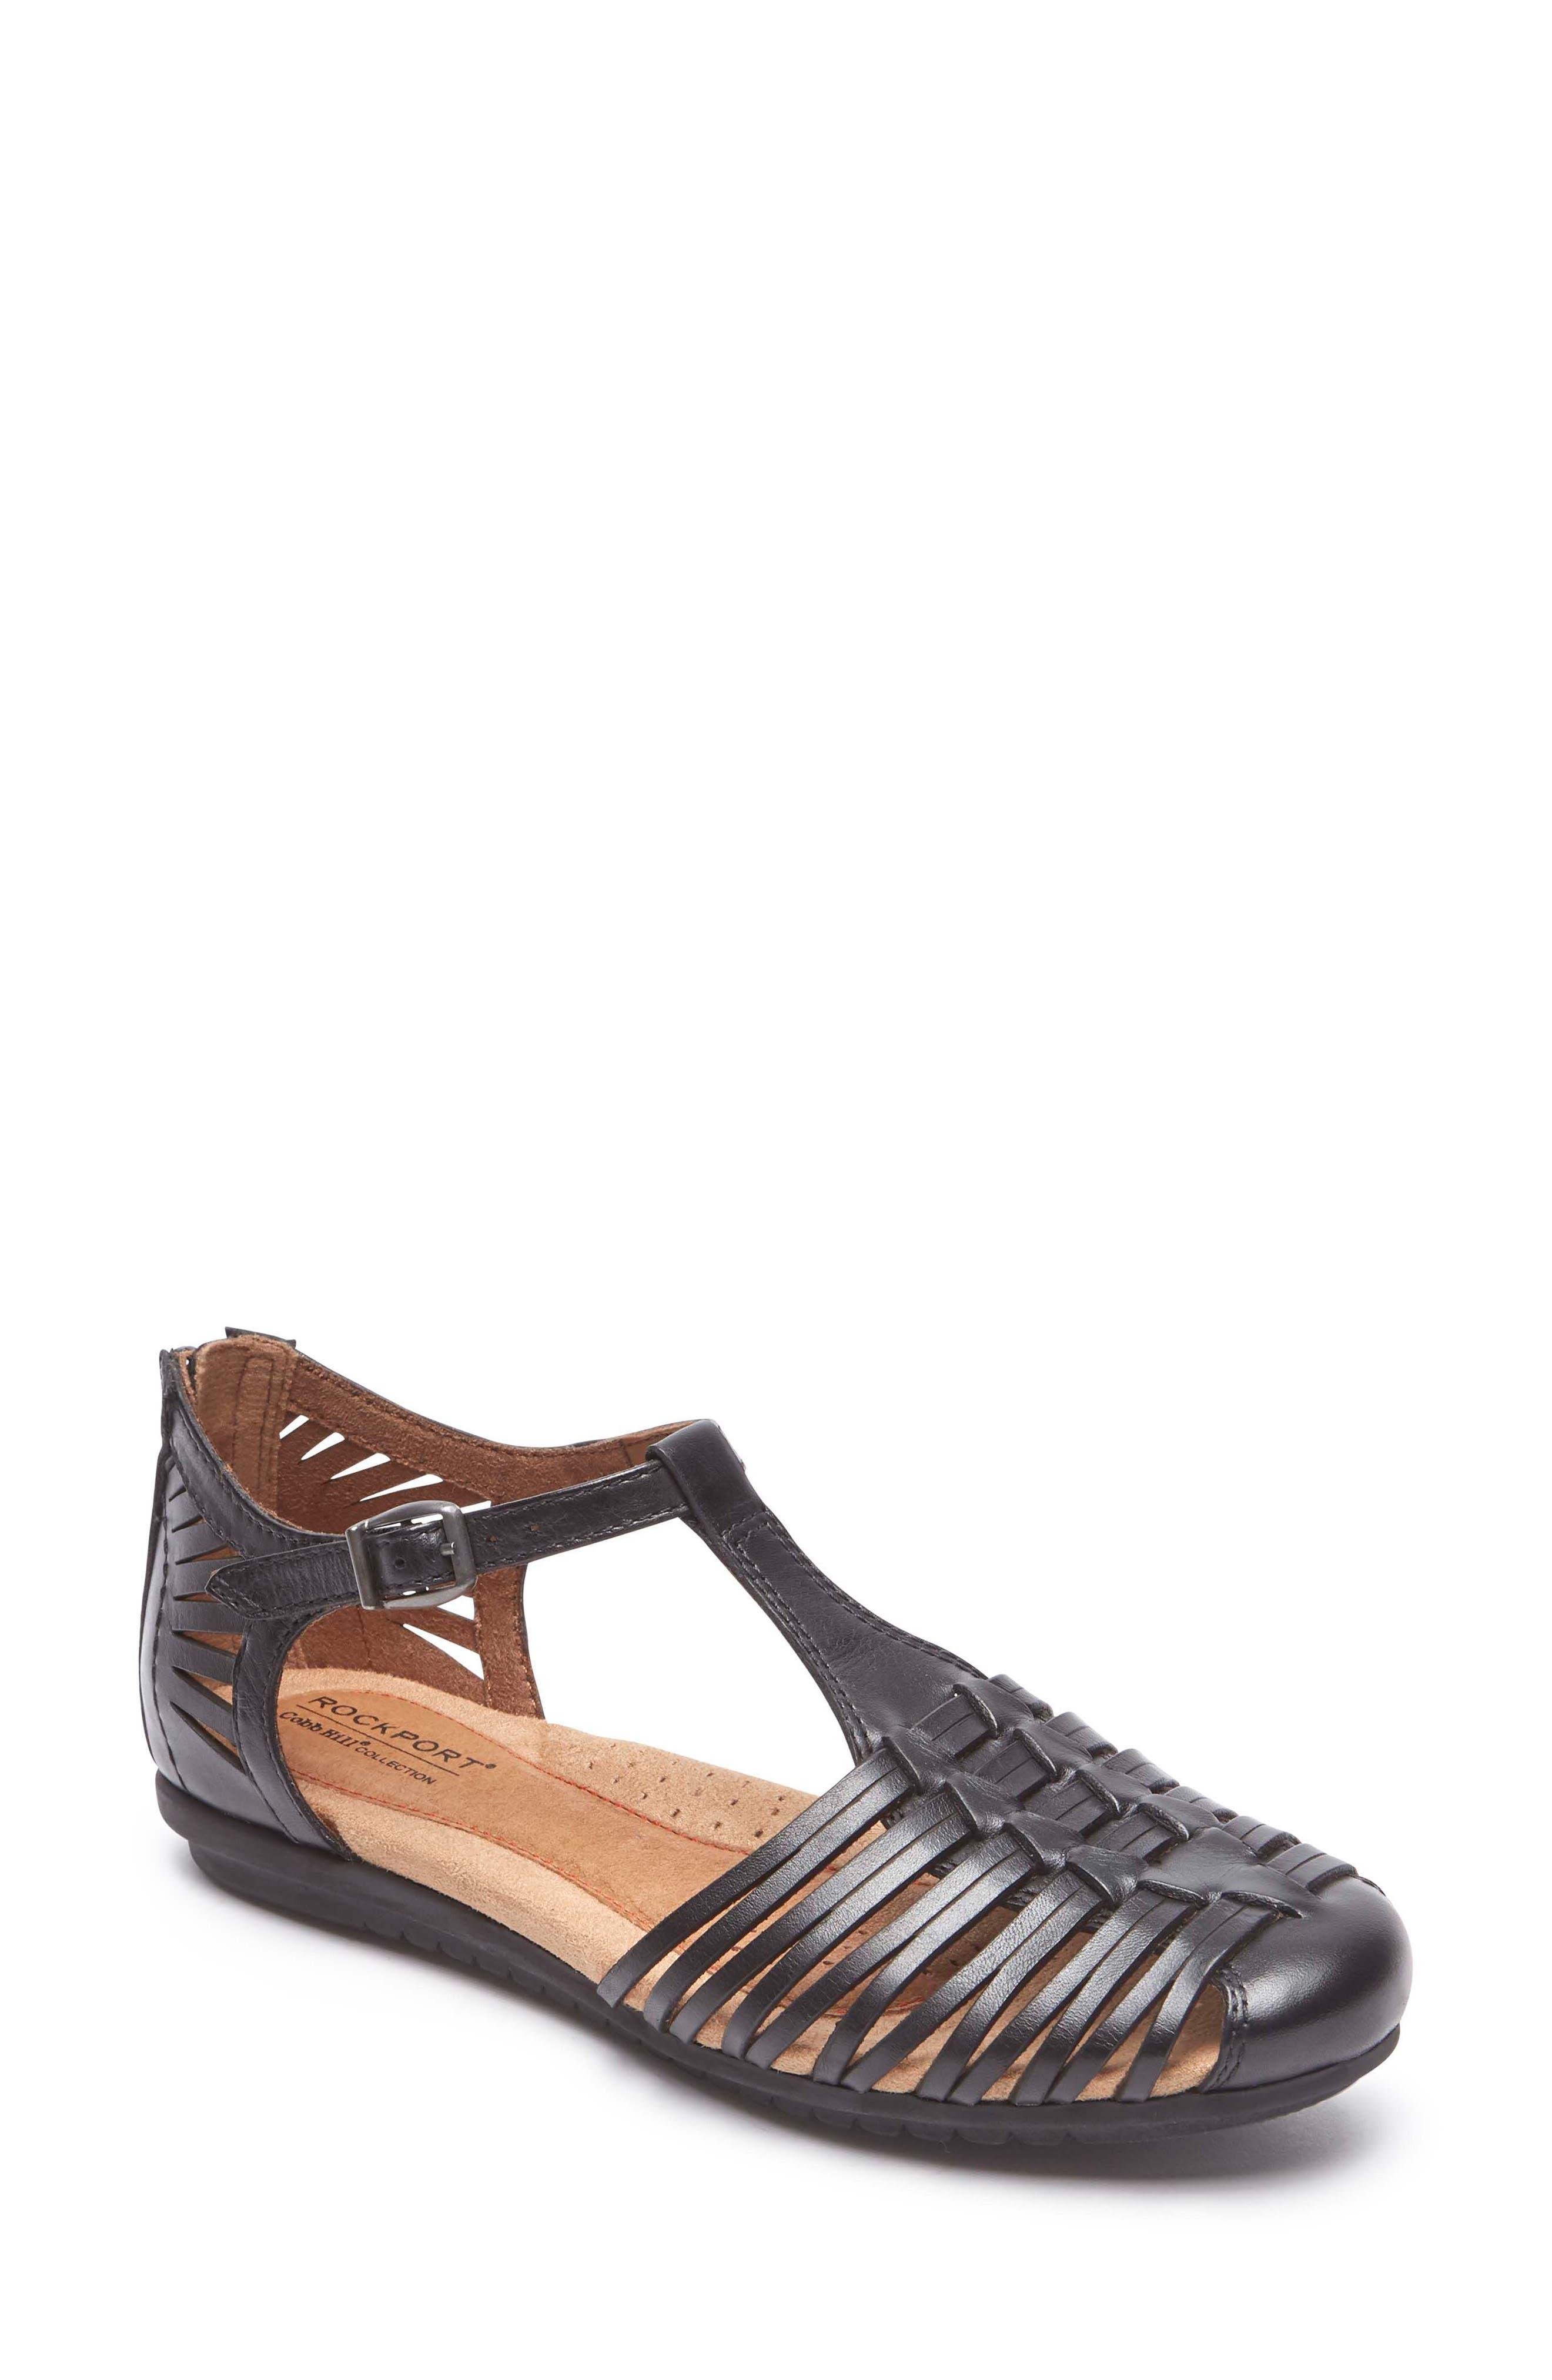 Inglewood Huarache Sandal,                         Main,                         color, BLACK LEATHER